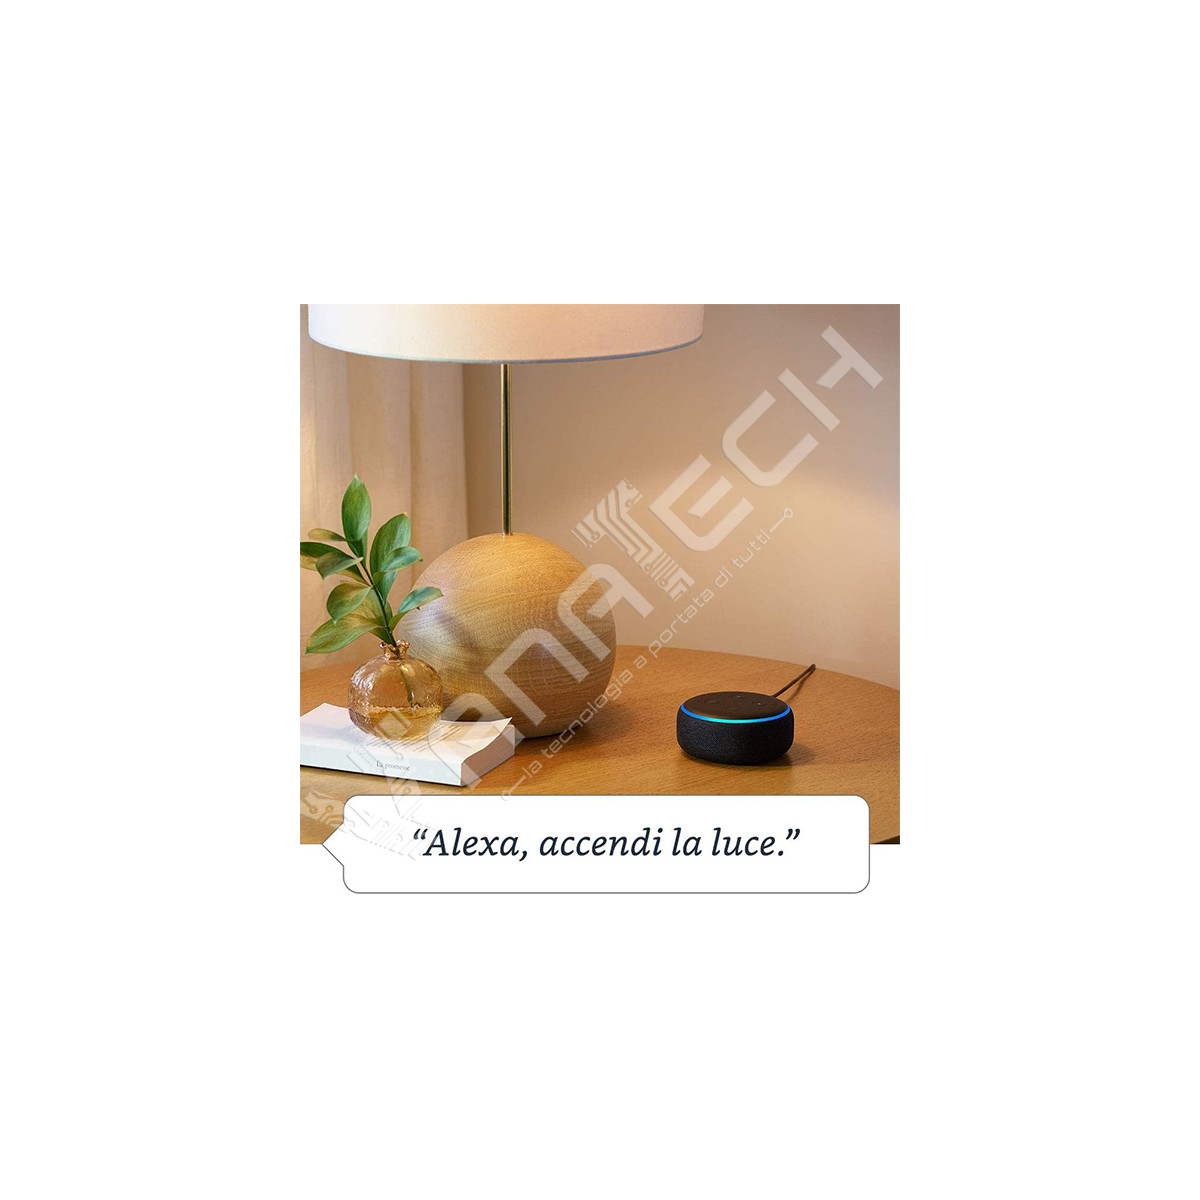 KIT LAMPADINE AUTO LUCI A LED ZES PER AUTO H1 50W IP67 X3 CAMPAER CAMION